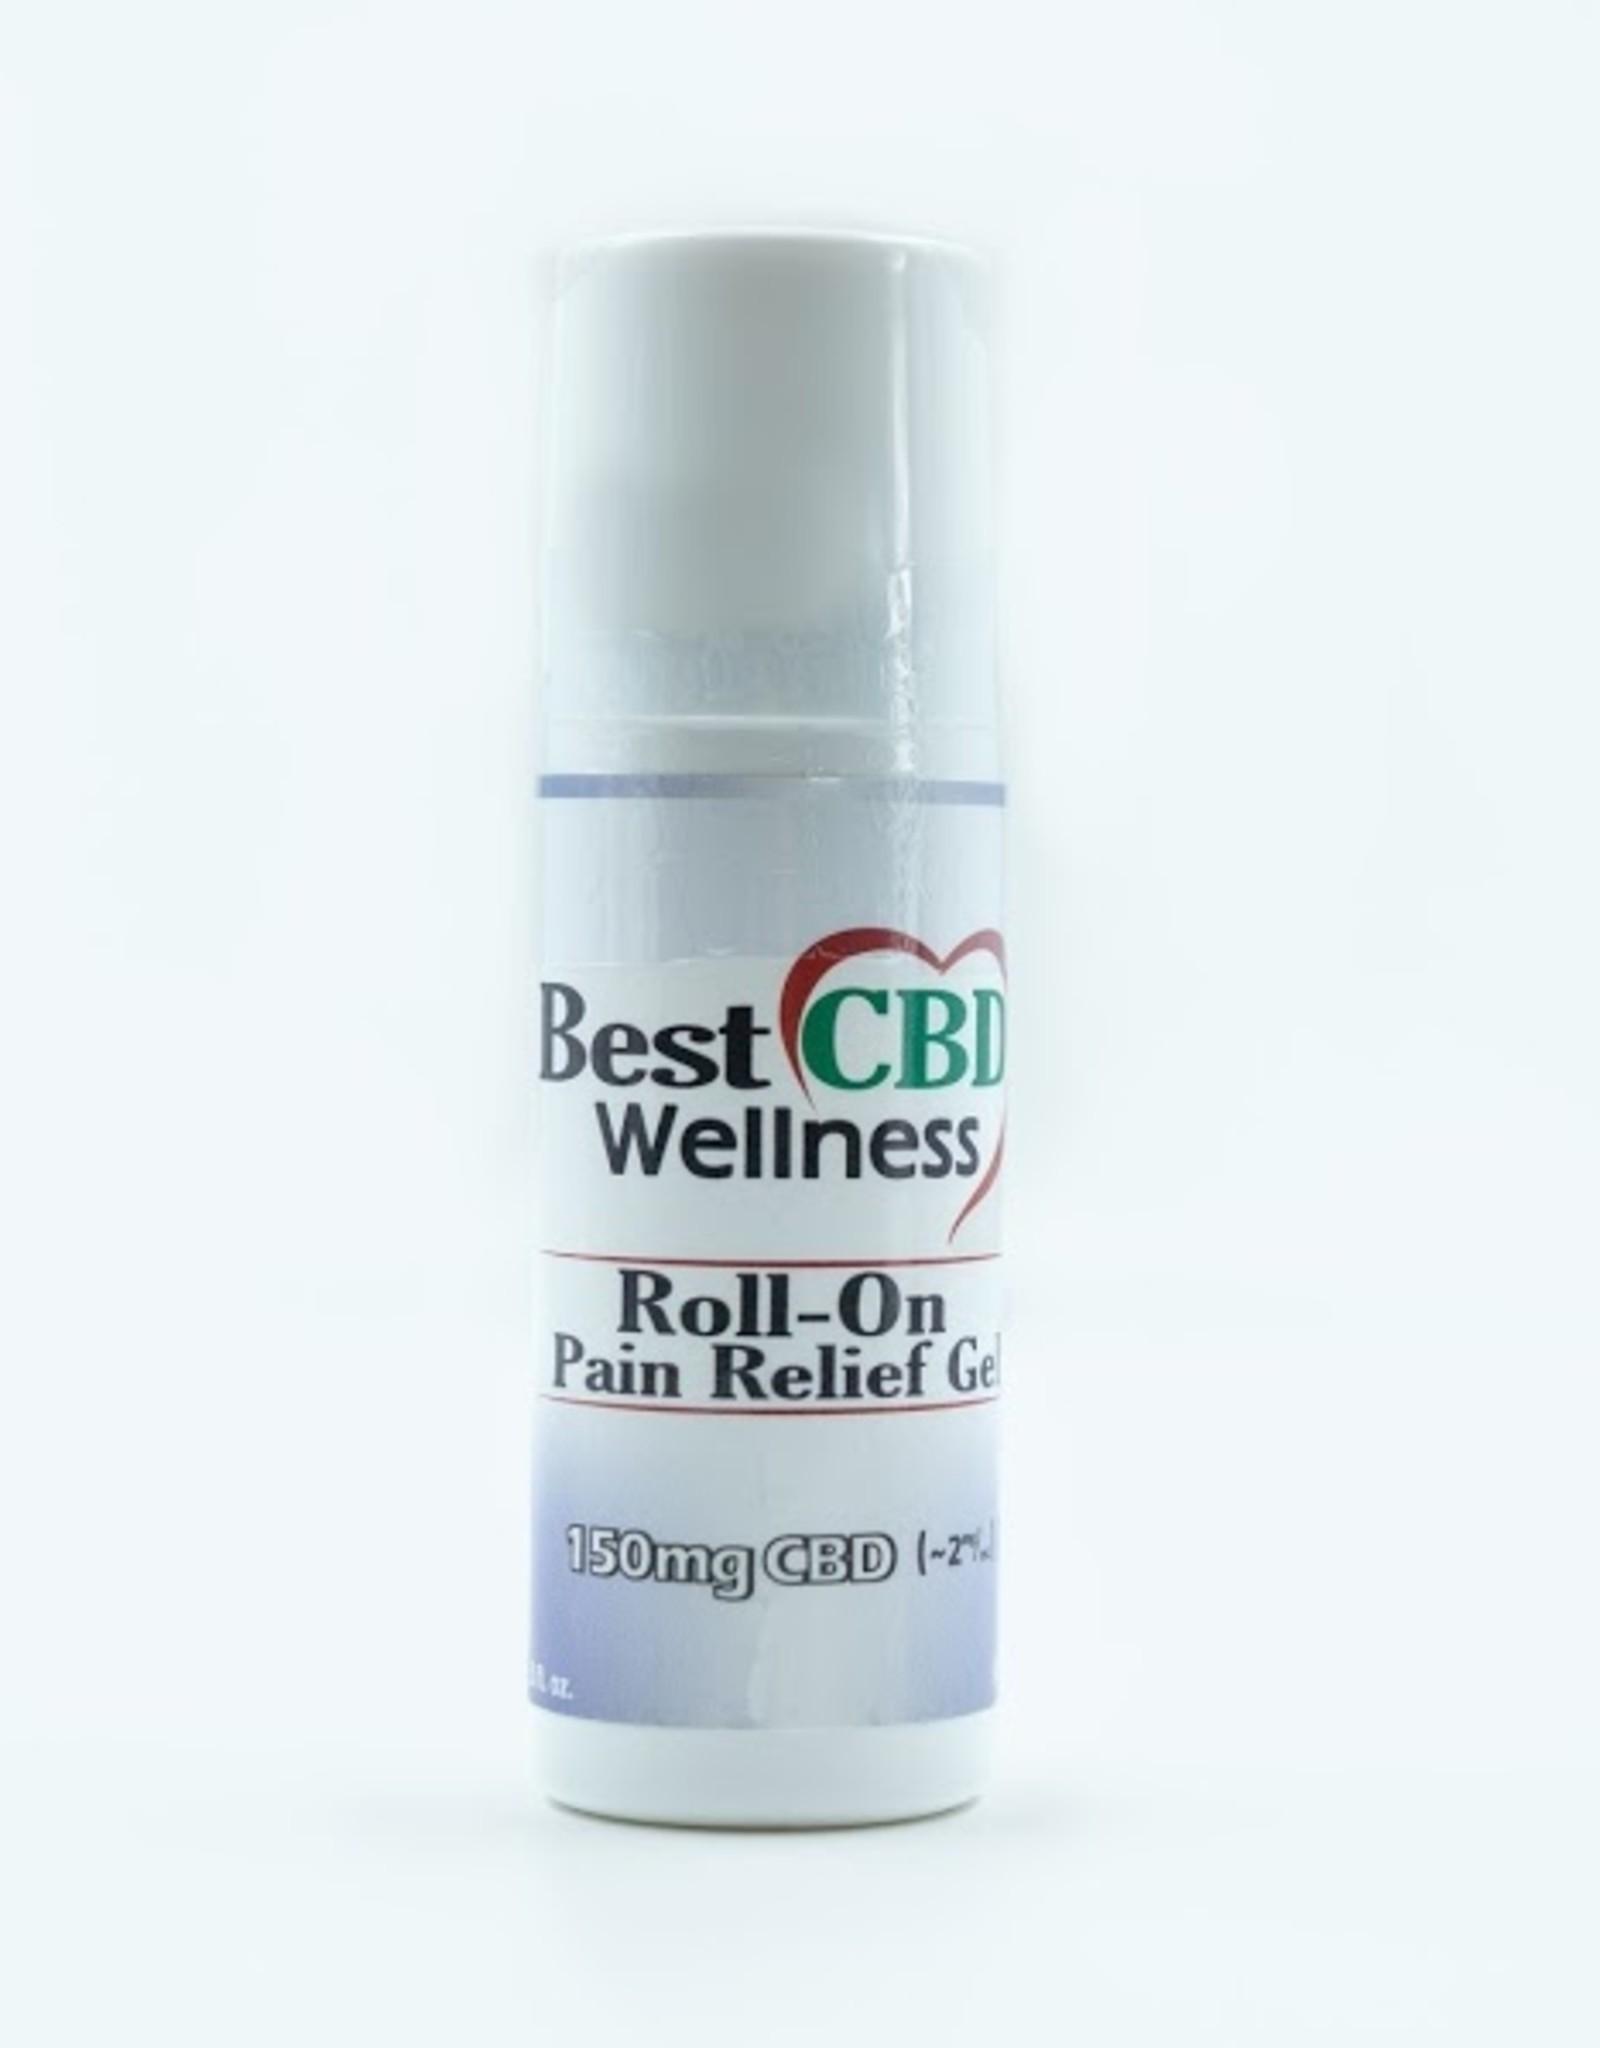 Best CBD Wellness Isolate CBD Roll-On Pain Relief Gel 150mg 3oz